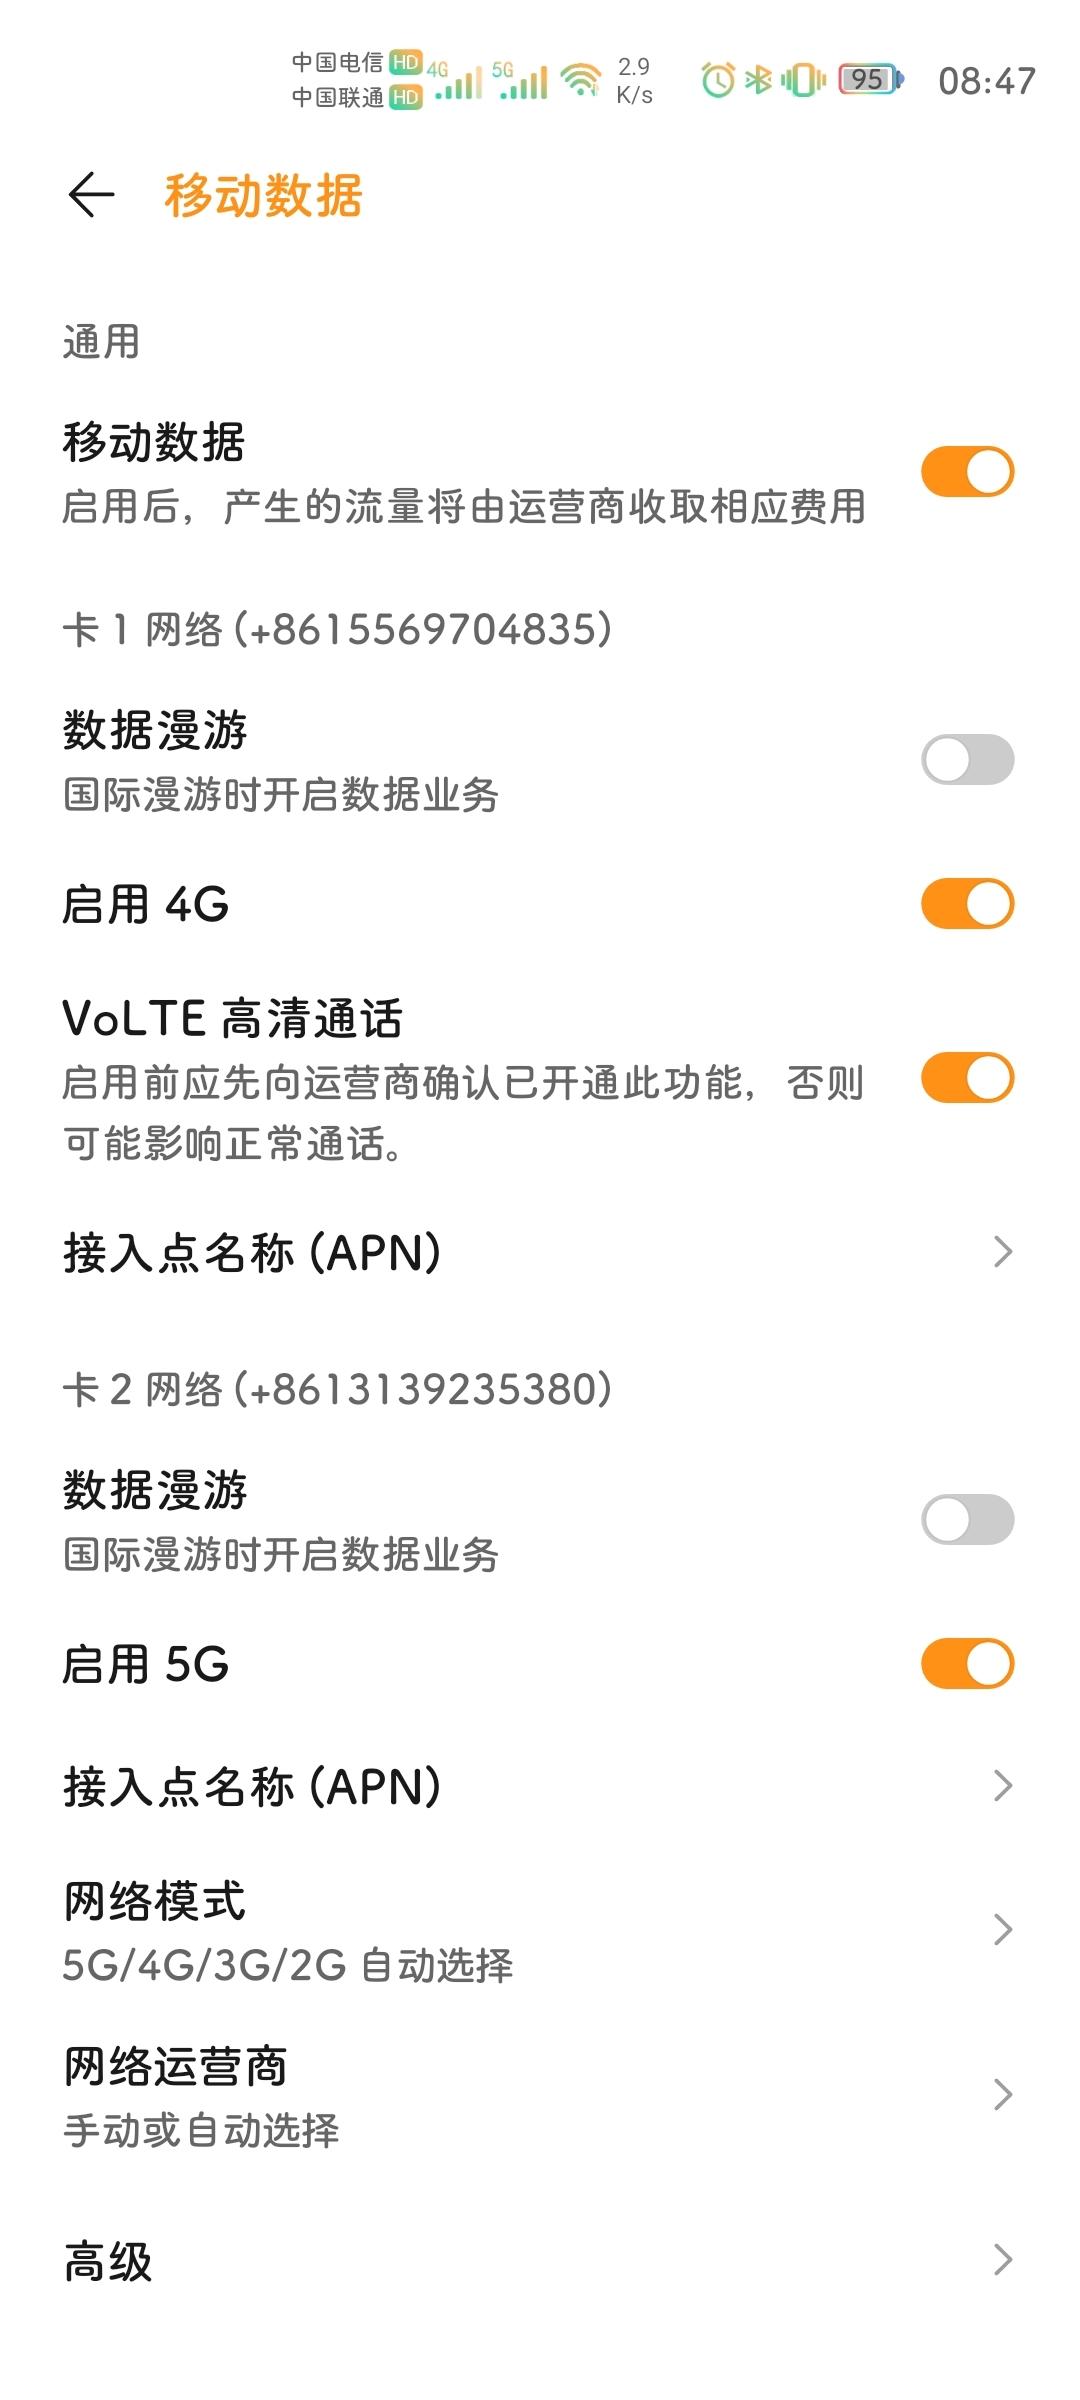 Screenshot_20210415_084747_com.android.phone.jpg